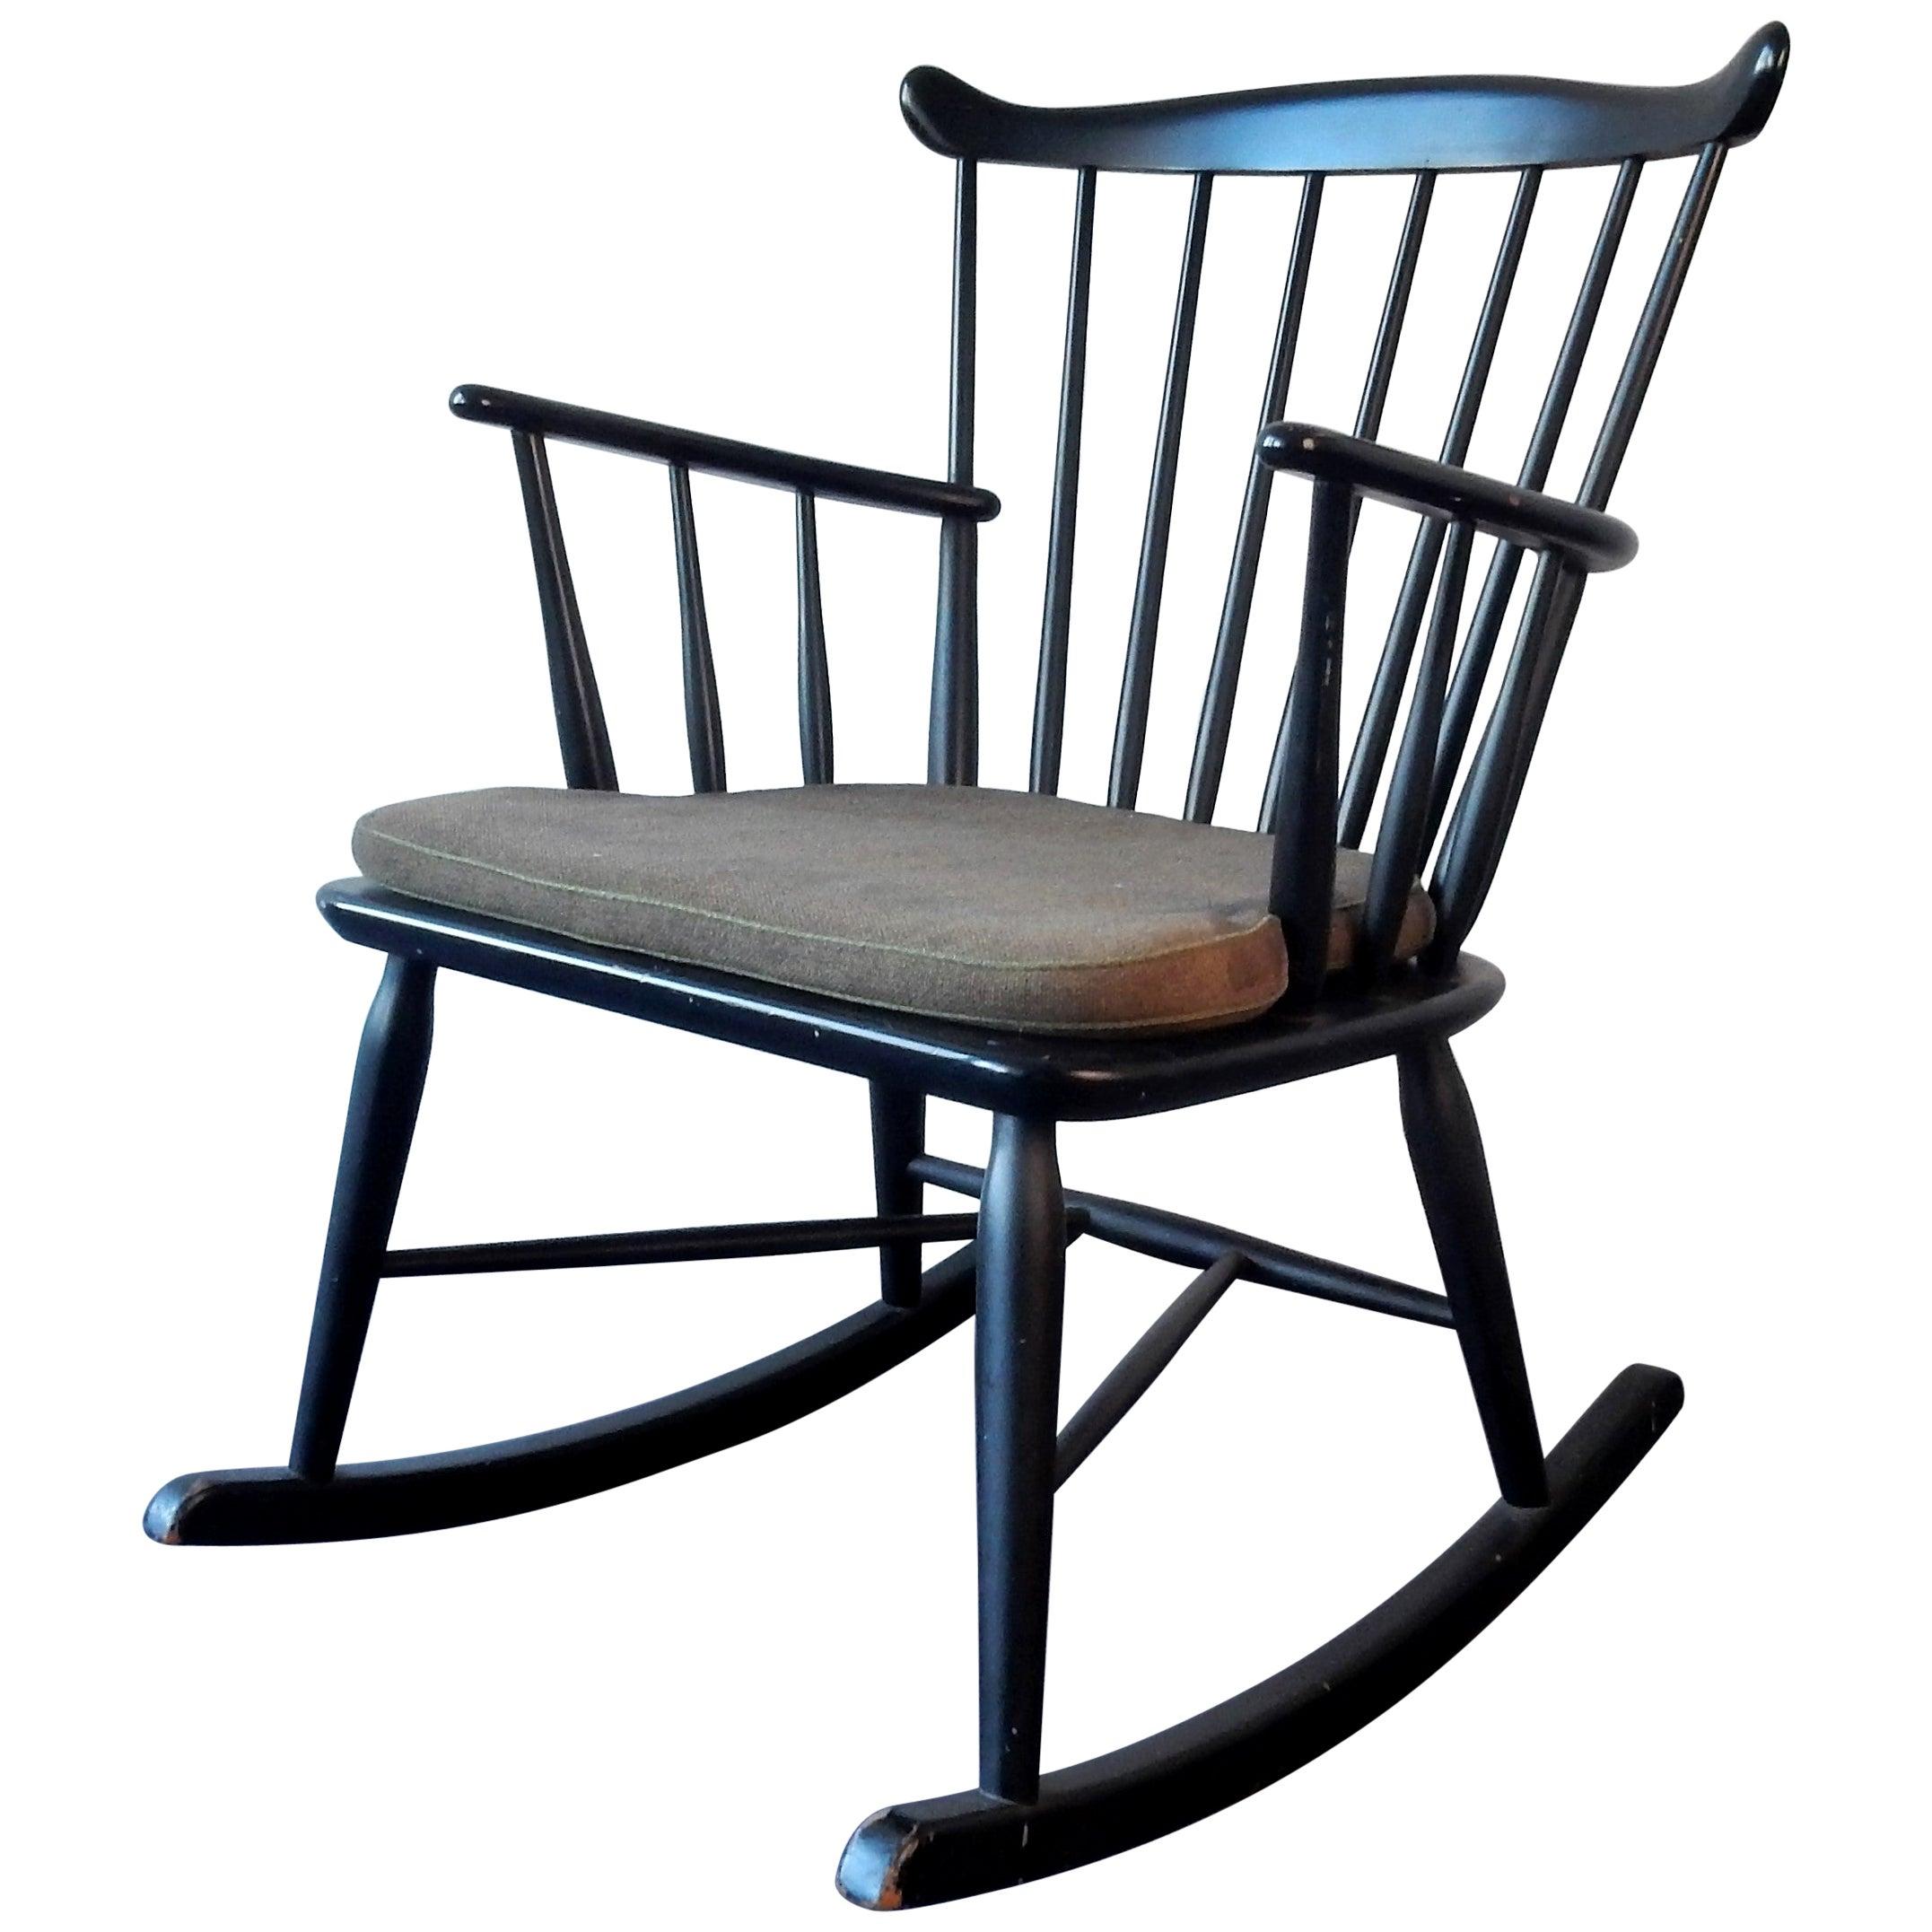 Rocking Chair by Farstrup, Denmark, 1960s